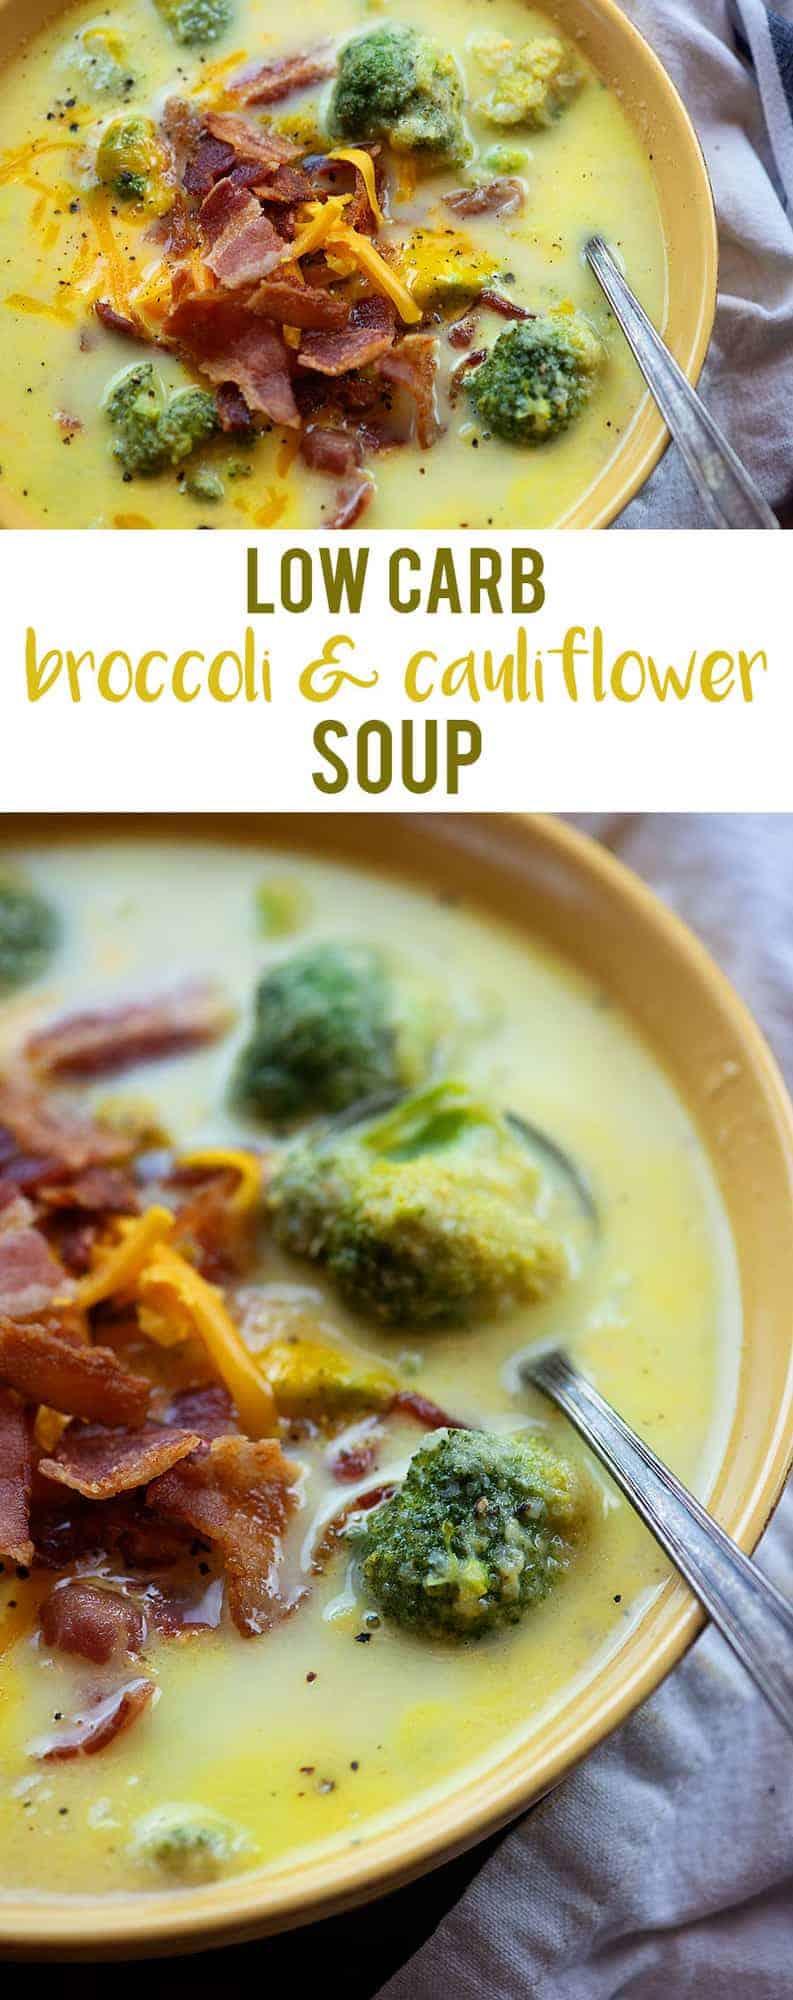 Broccoli Cauliflower Soup That Low Carb Life